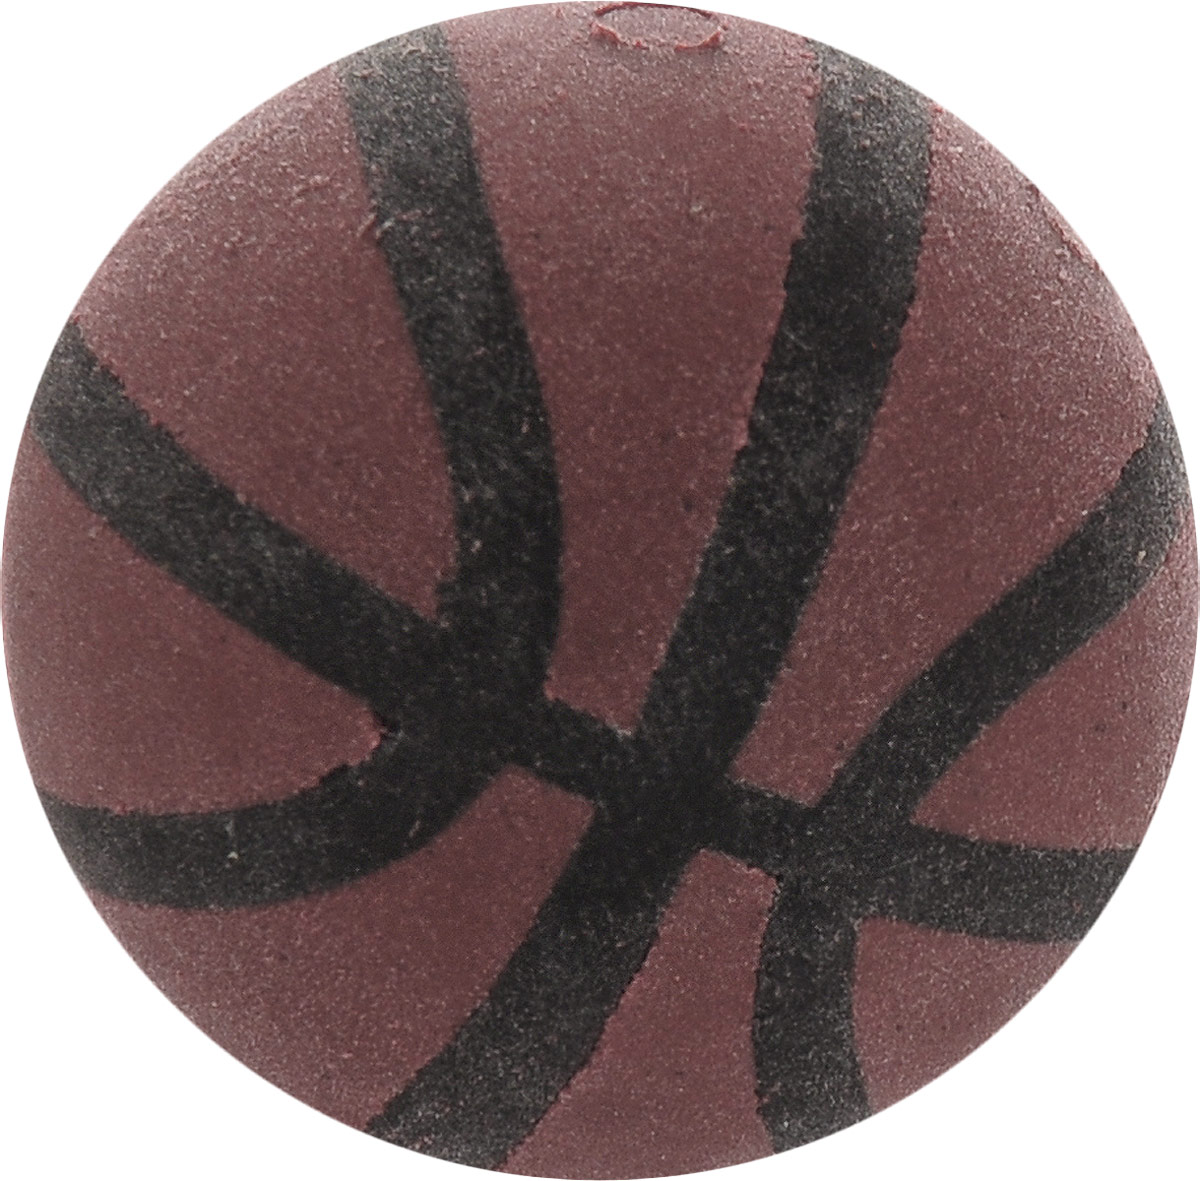 Brunnen Ластик Мяч баскетбольный цвет коричневый brunnen ластик машинка